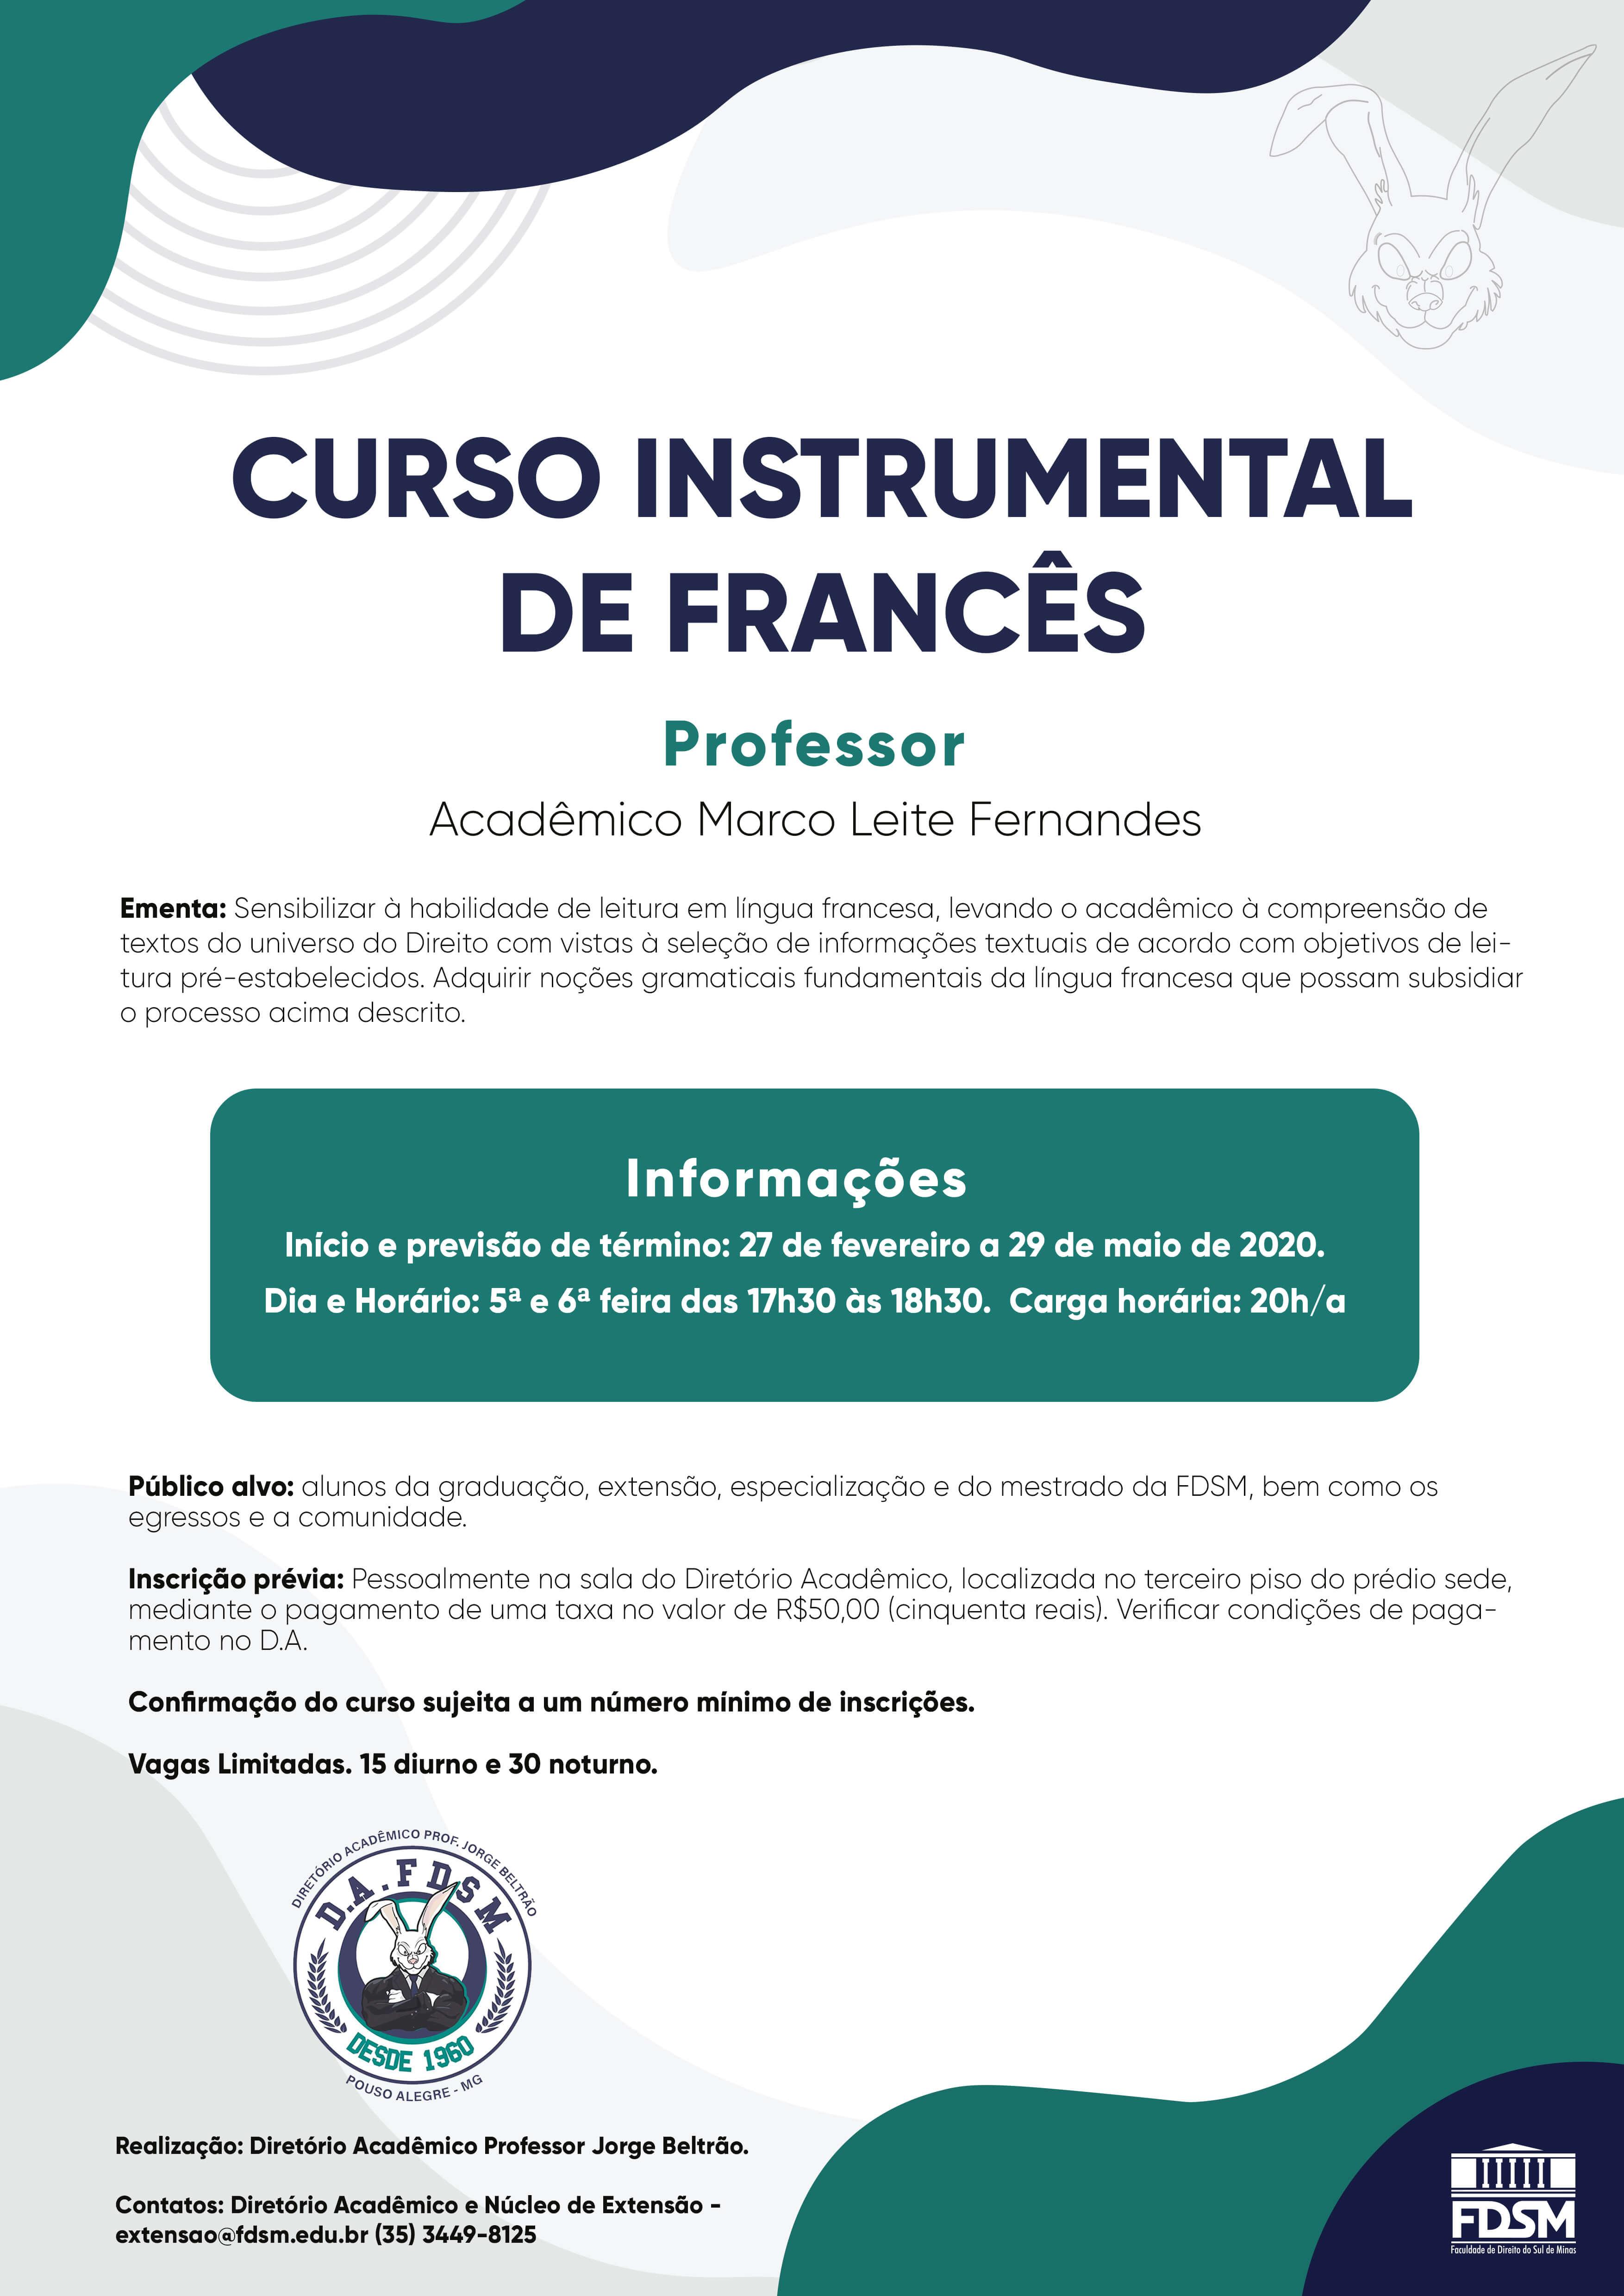 Noticia 6262 - CURSO INSTRUMENTAL DE FRANCÊS